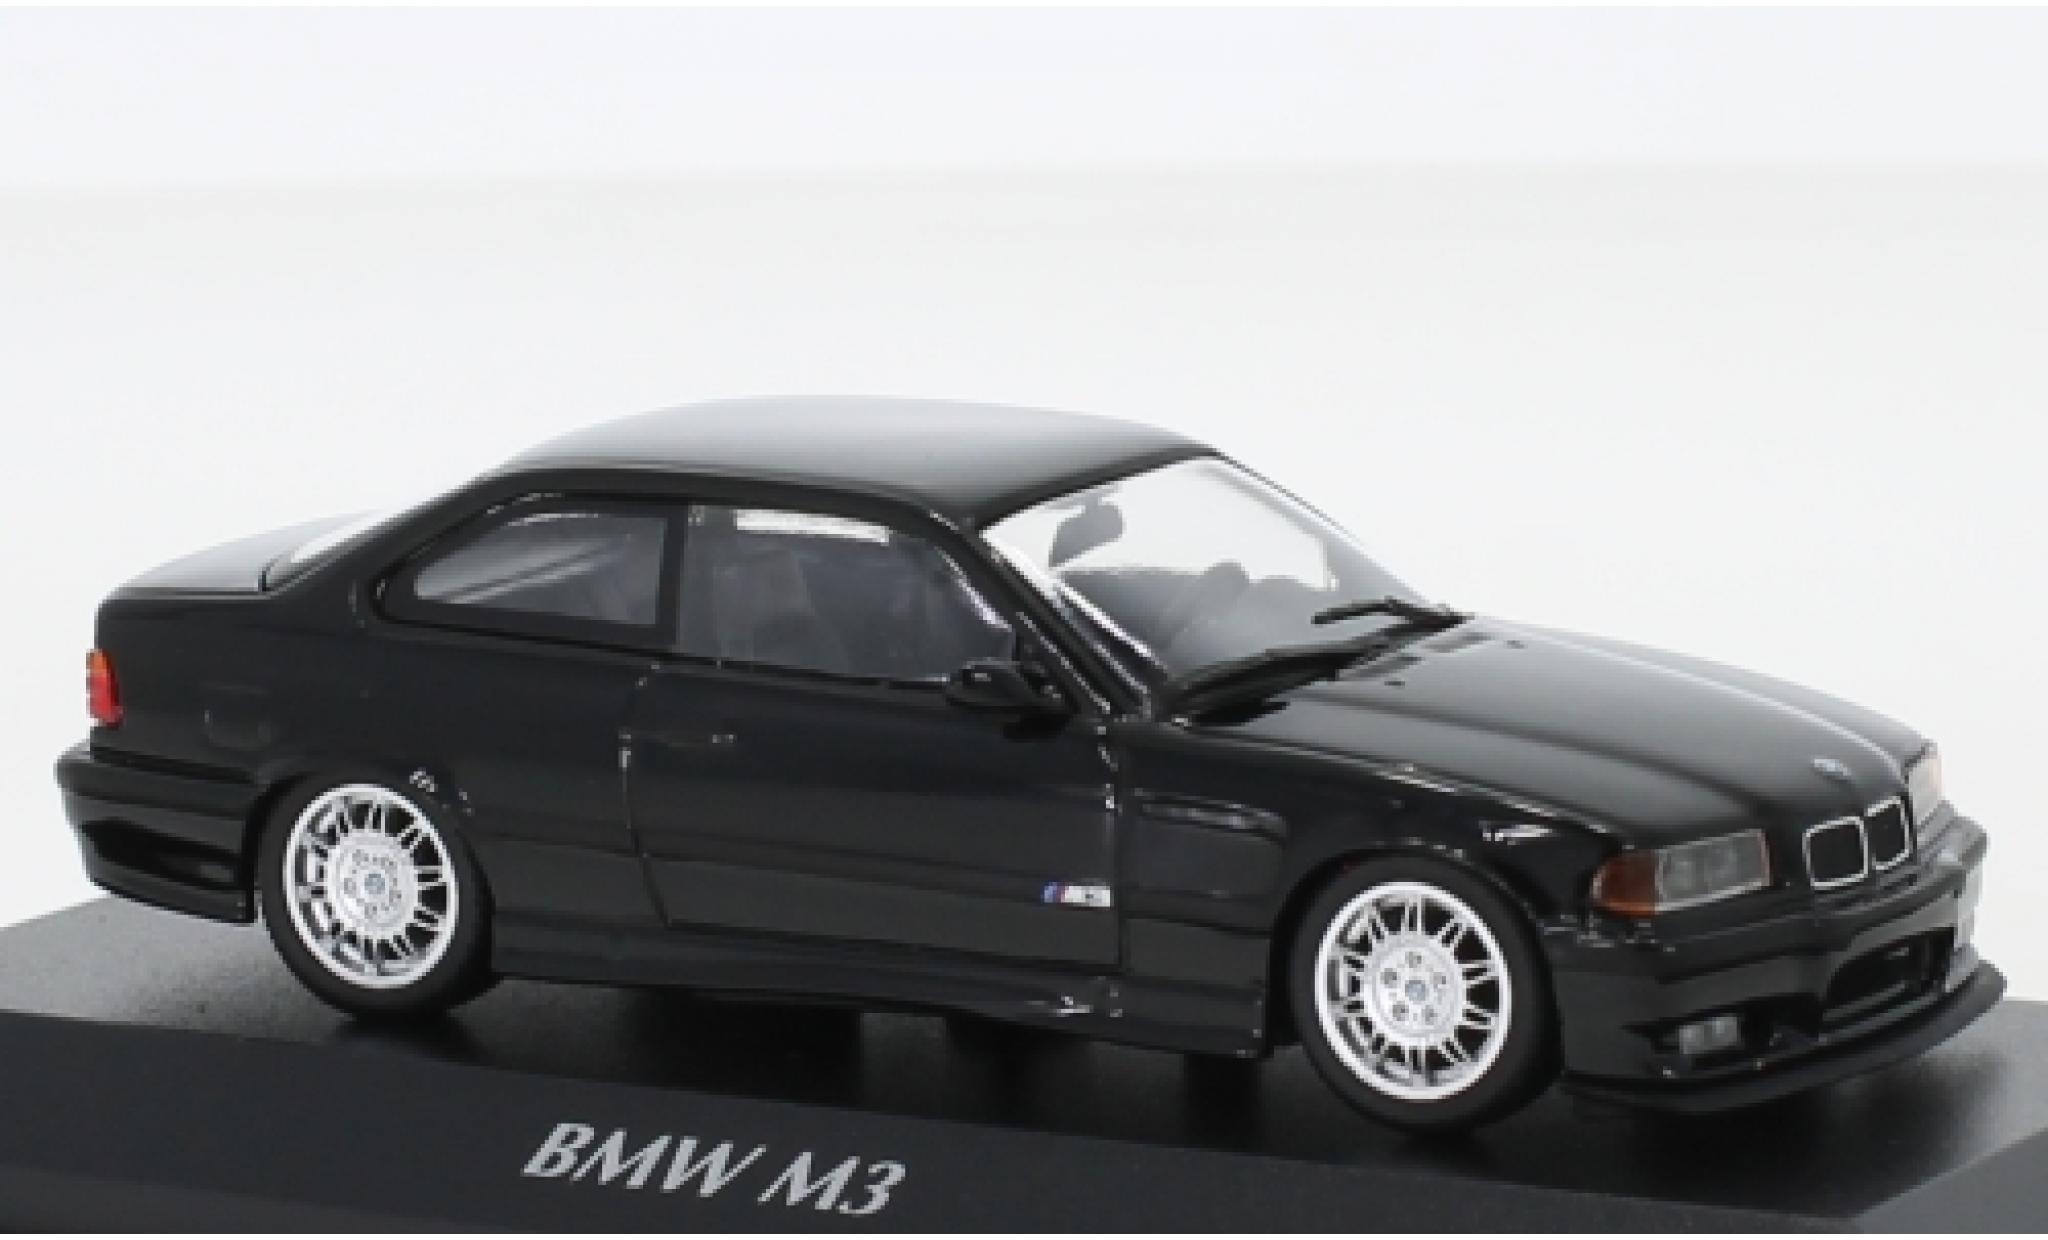 - 1992 E36 Minichamps 1:43 BMW M3 black